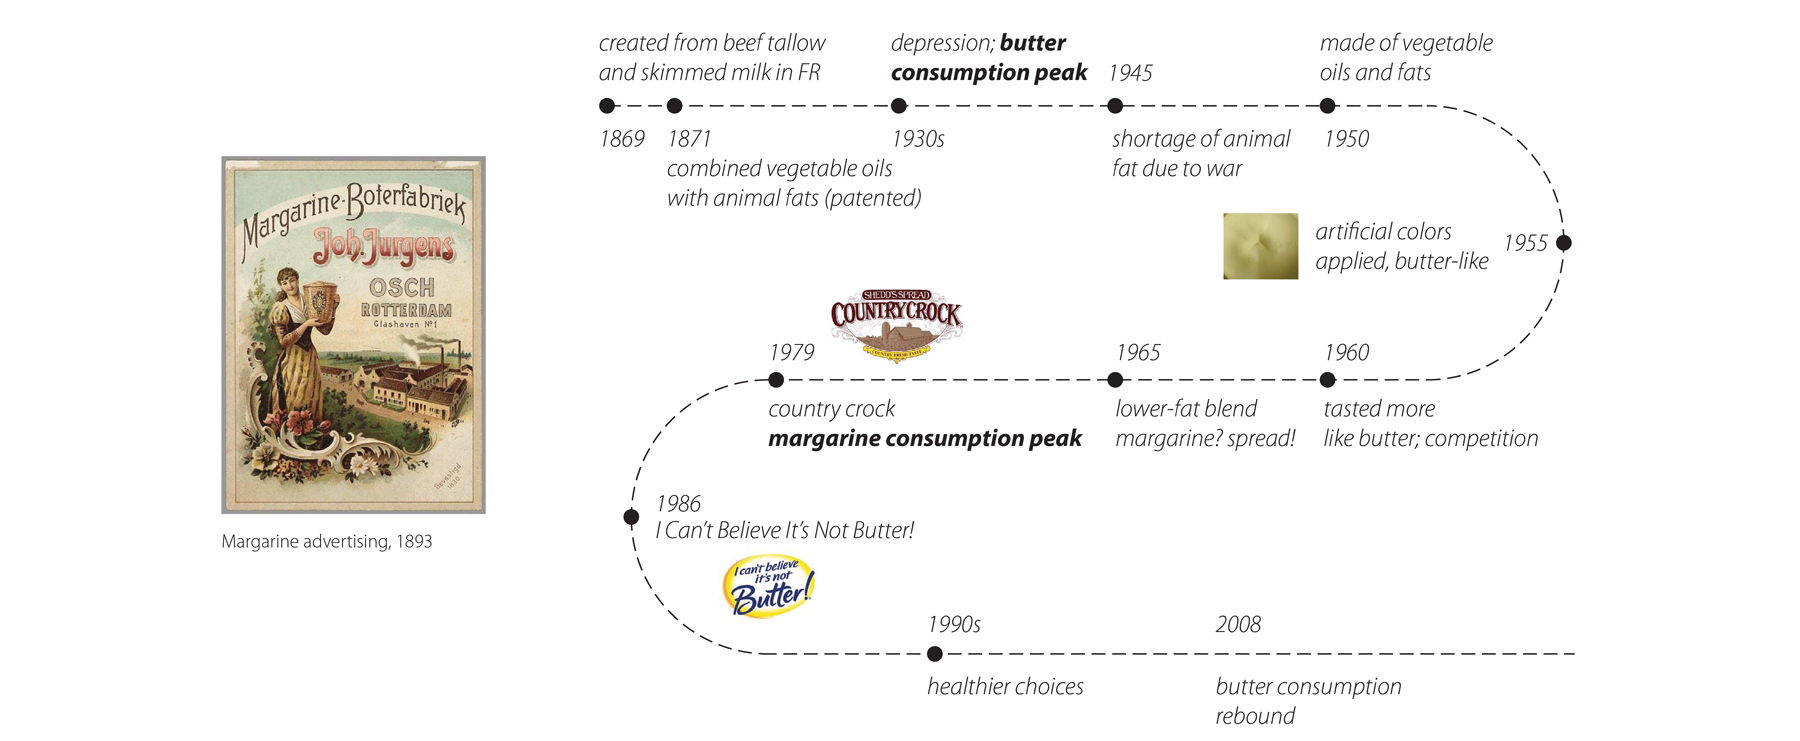 History of Margarine